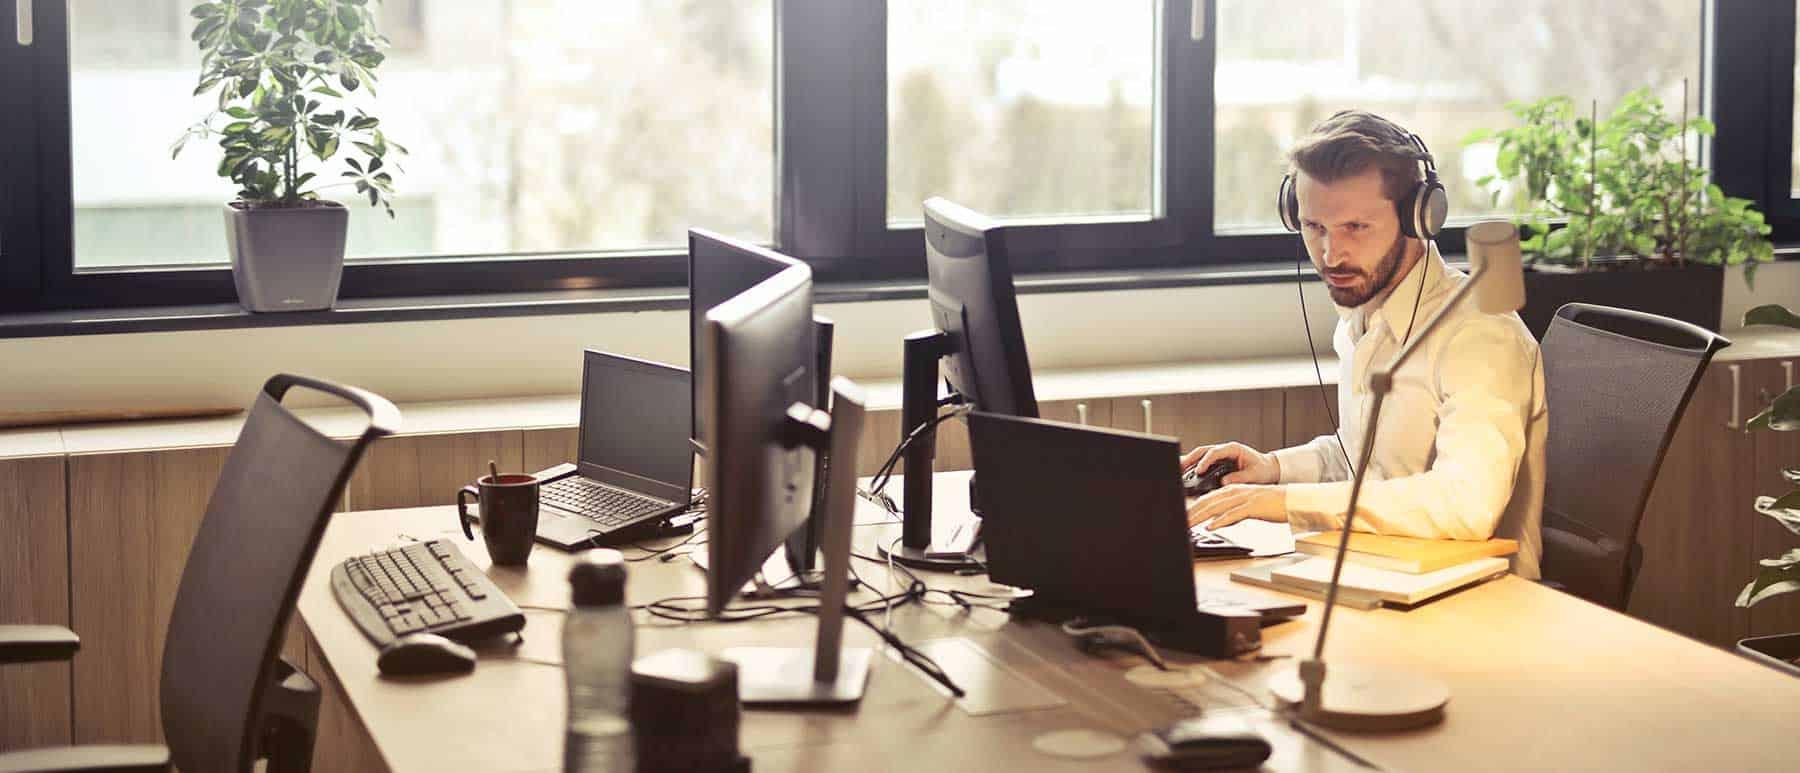 Online Jobs for Teens - Customer Service